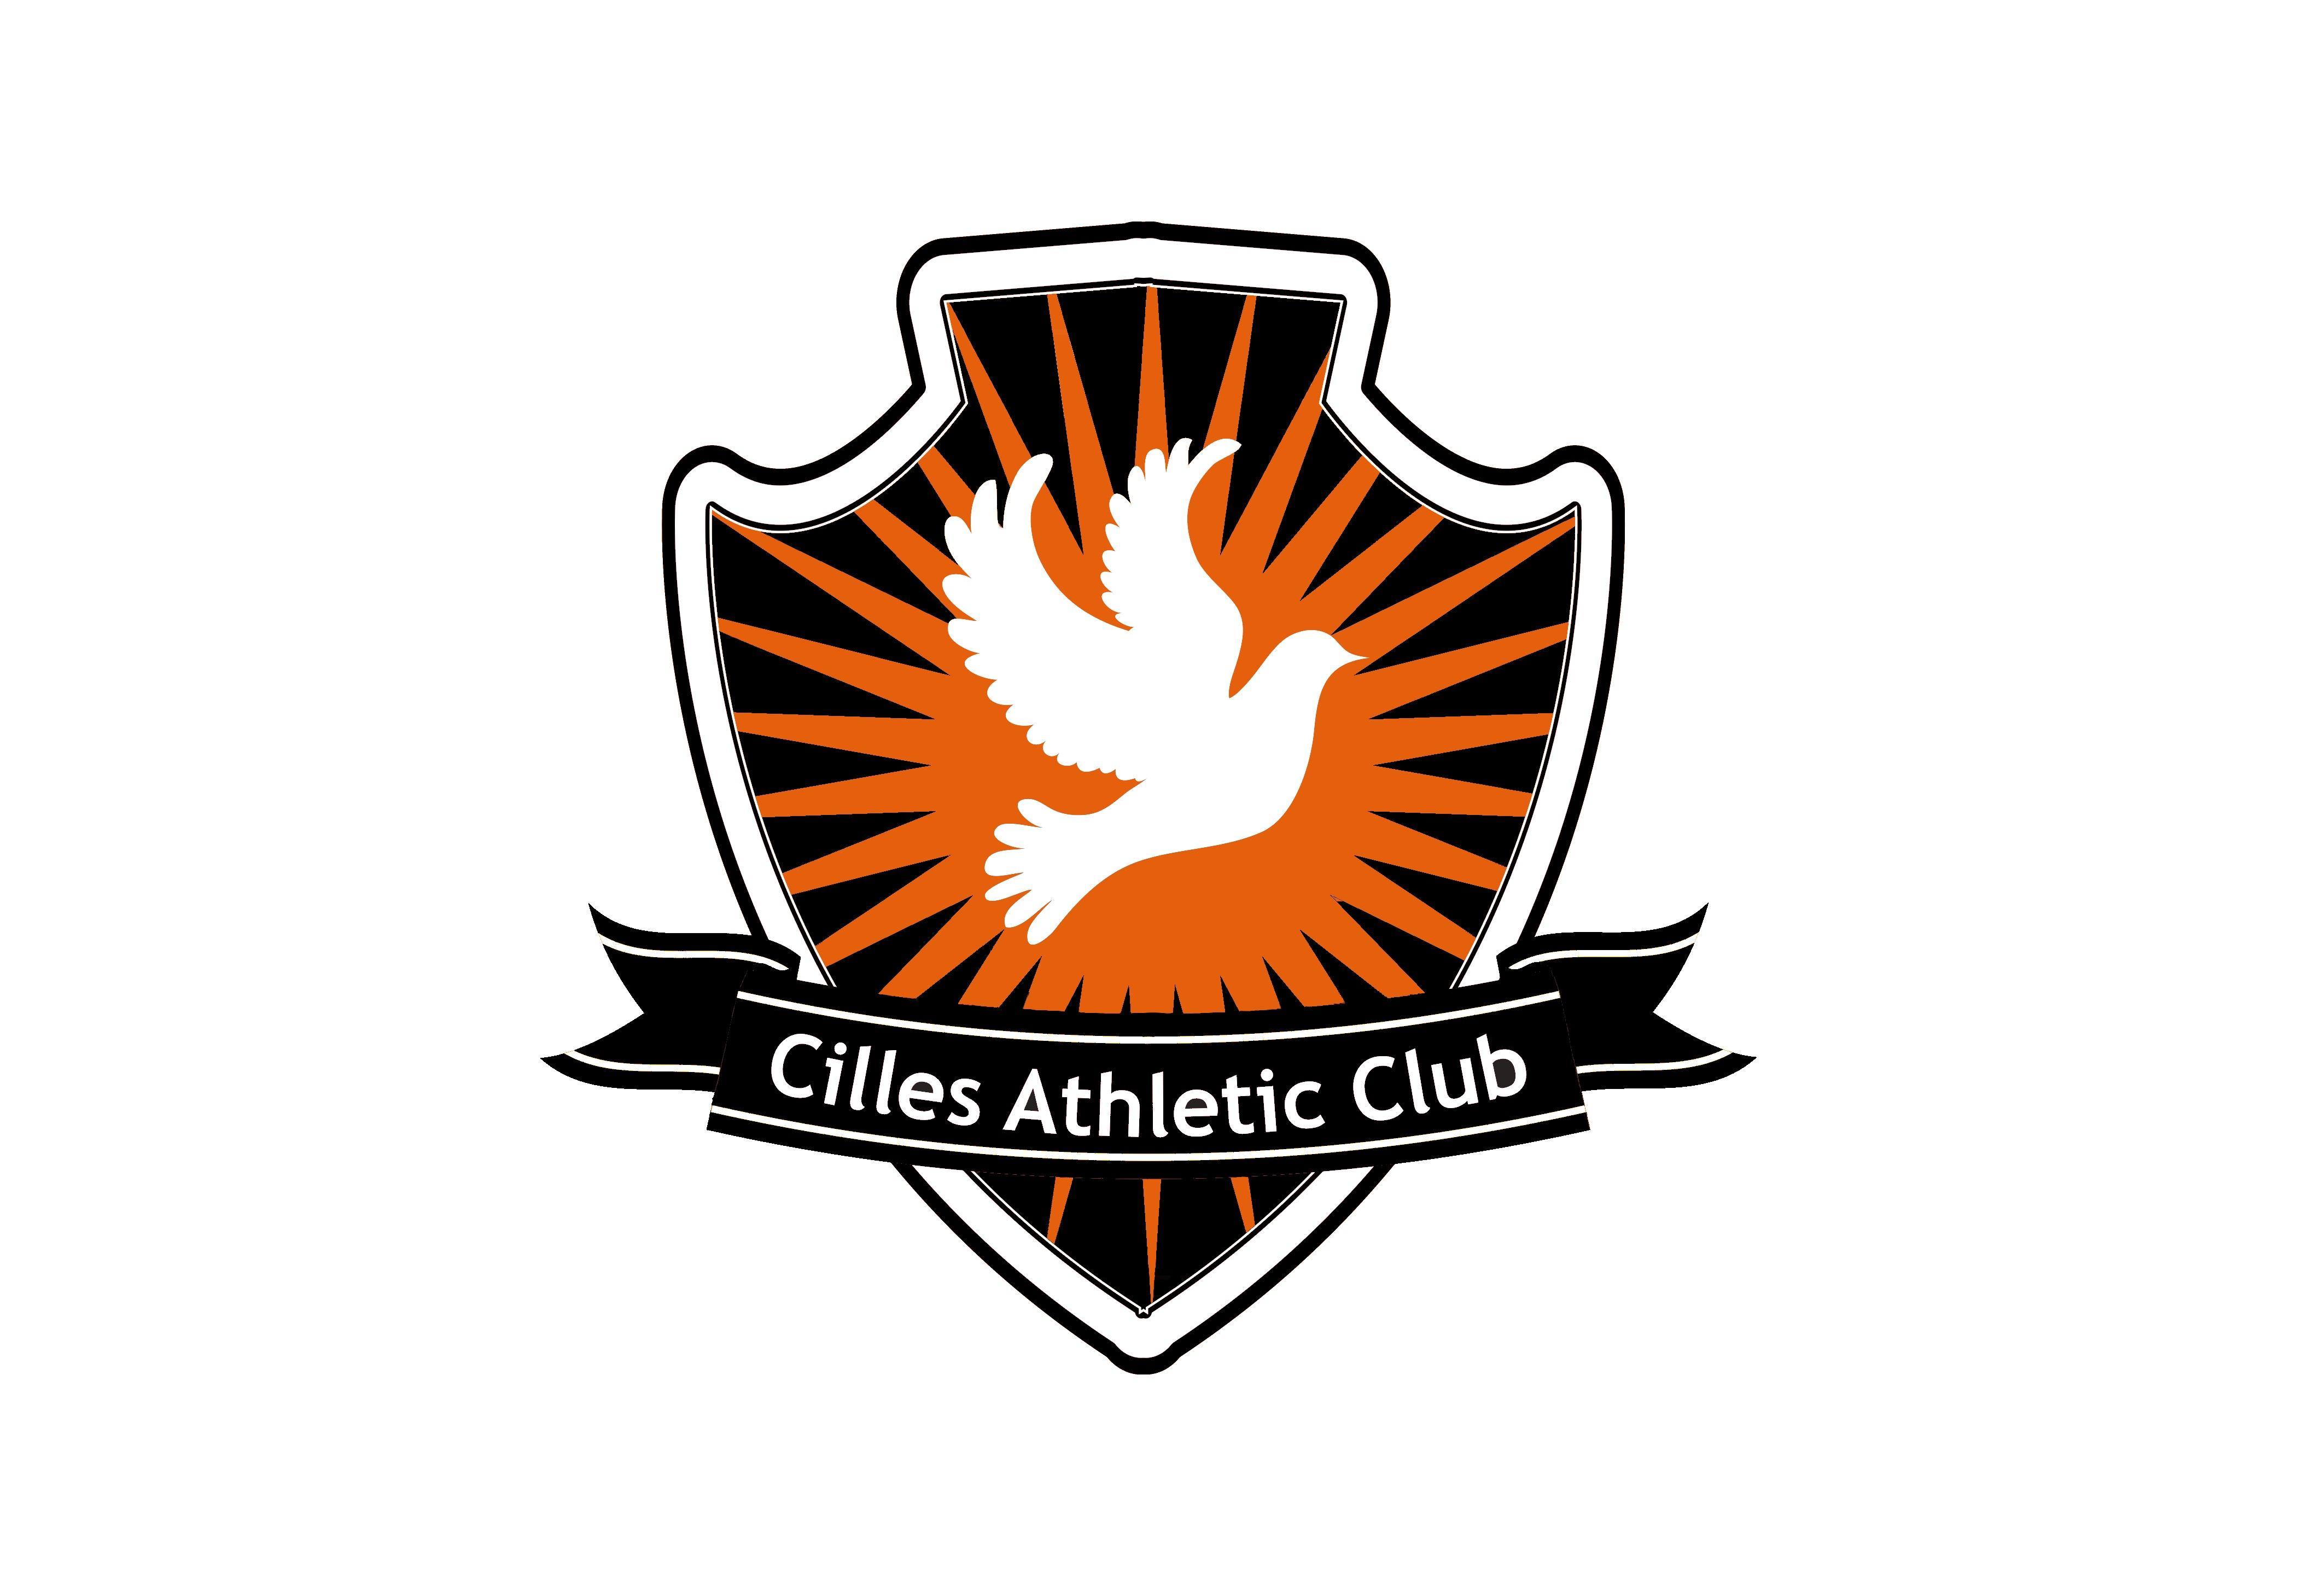 Cilles AC - Athletics for Juveniles Register your Interest